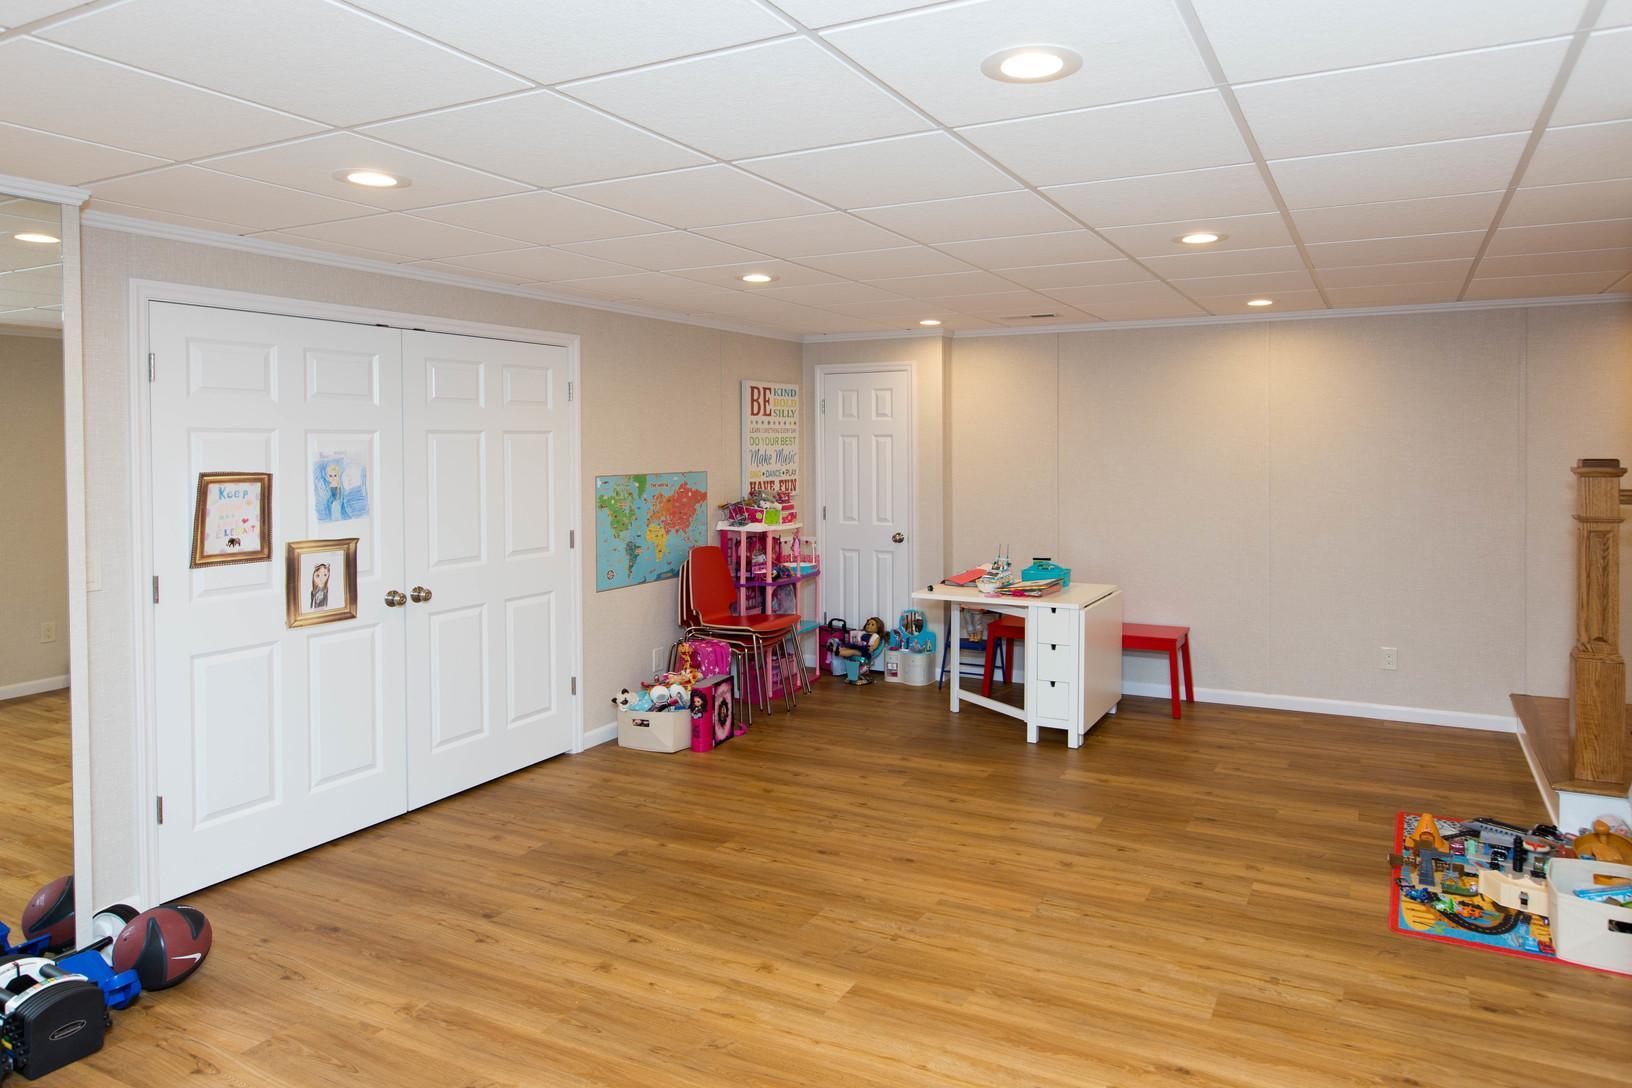 Basement Playroom - AFTER